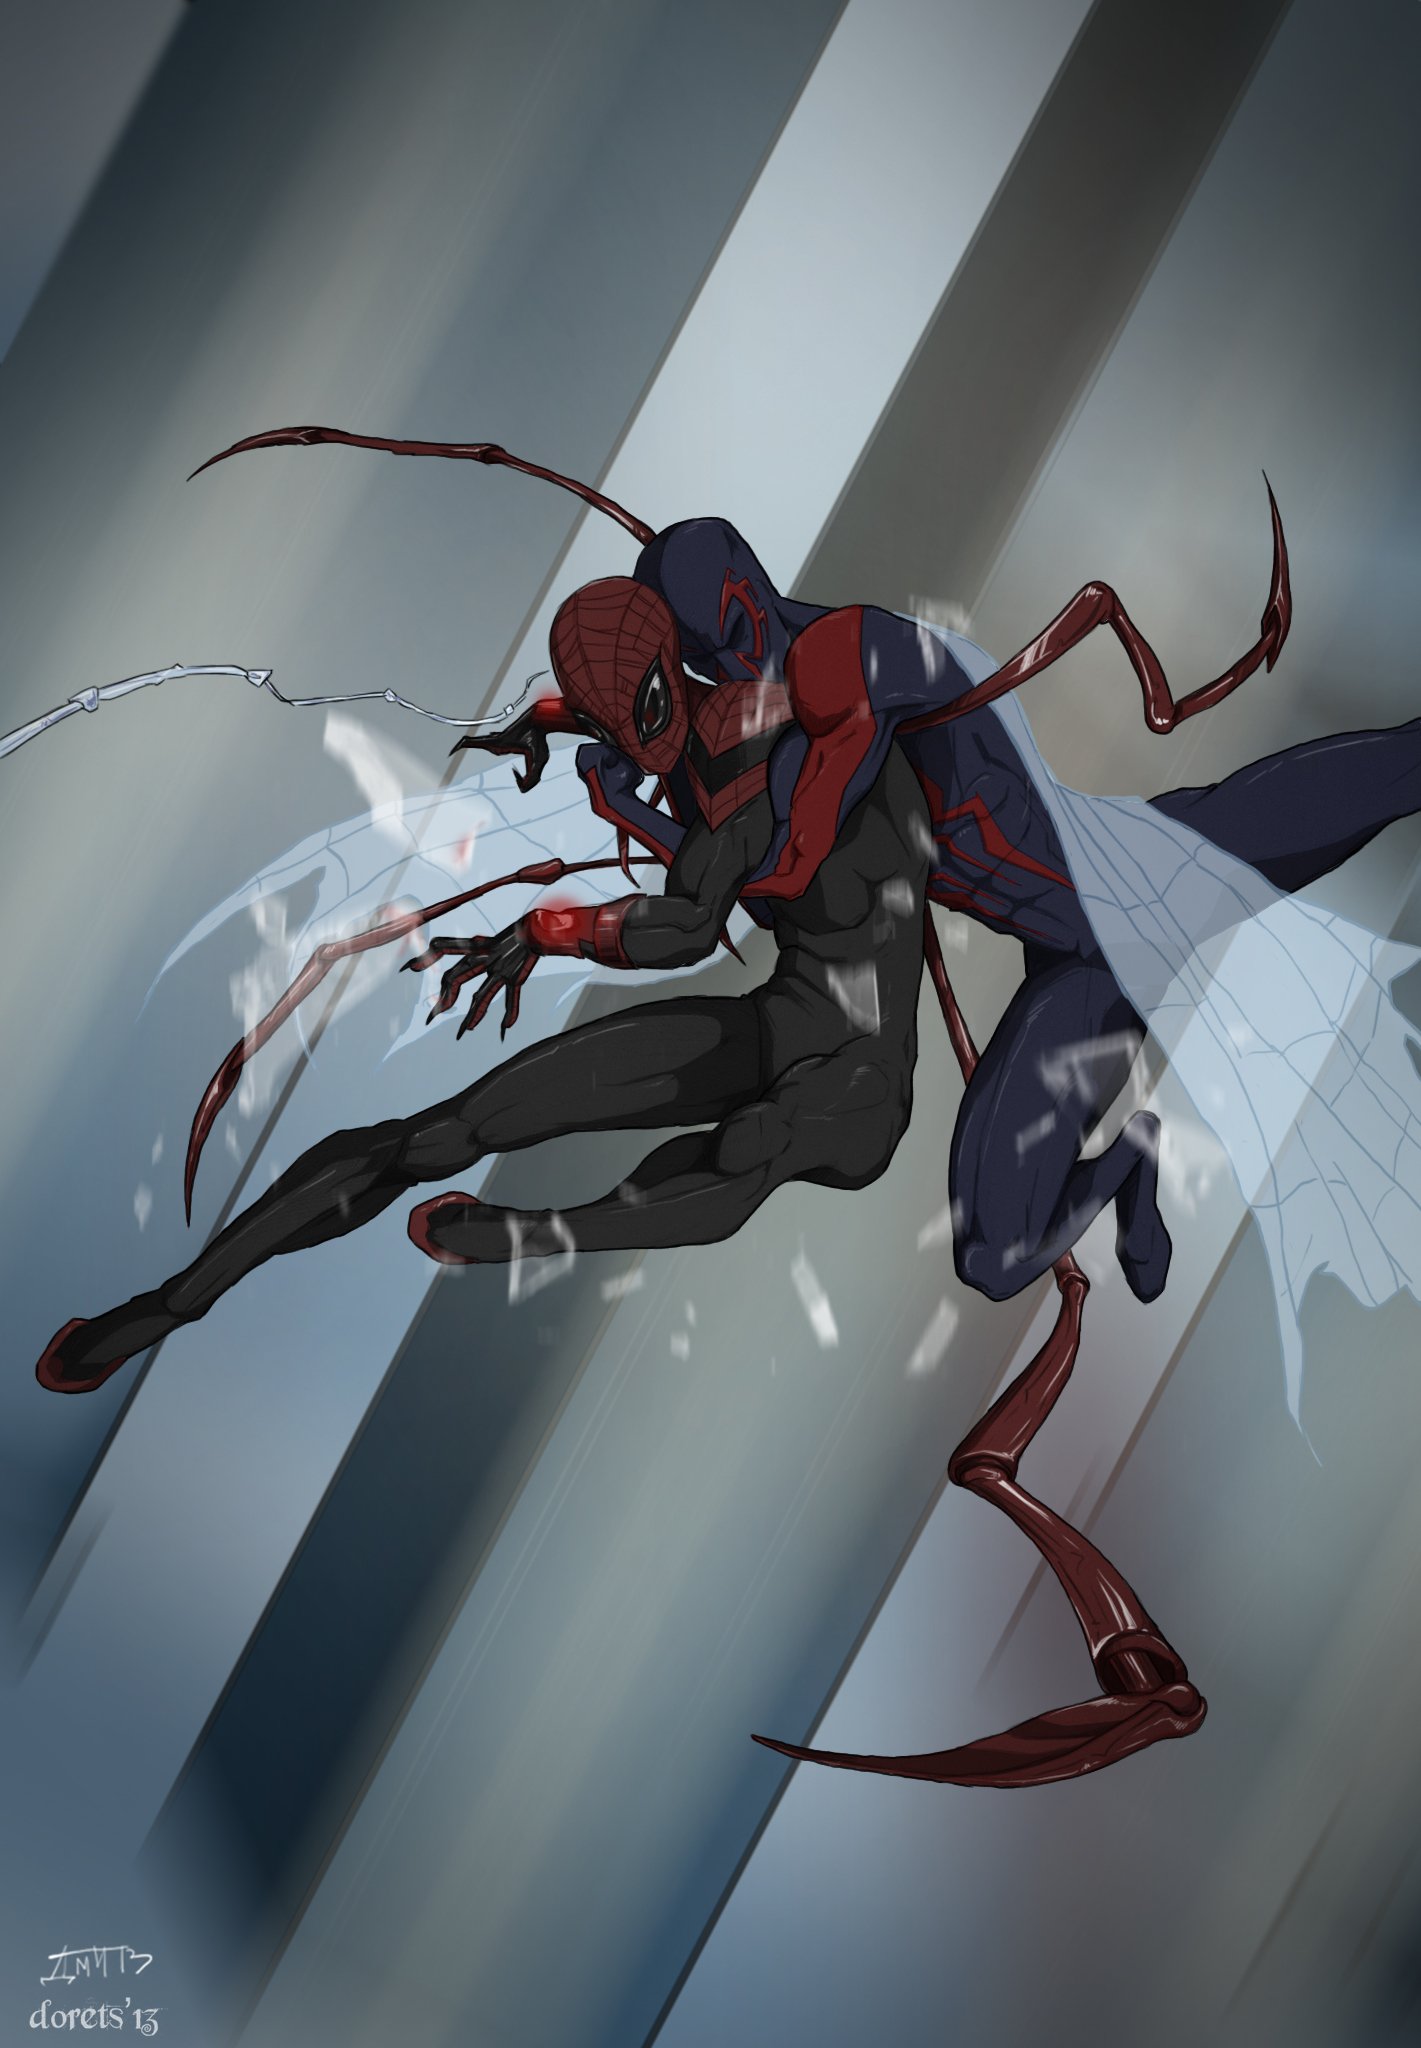 Superior Spider-Man VS Spider-Man 2099 by deu-O on DeviantArt